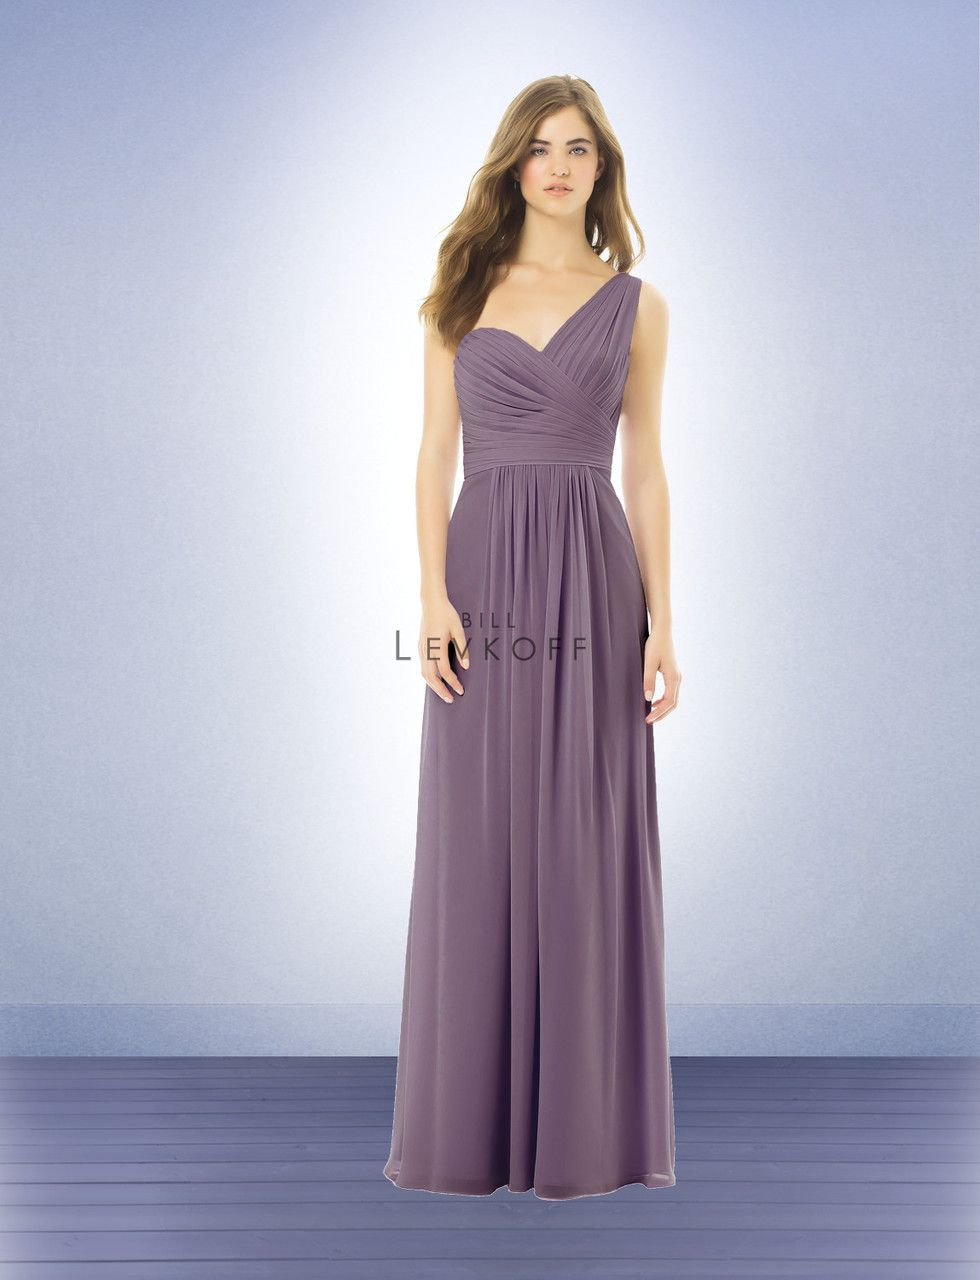 Bill Levkoff Bridesmaid Dress Style 492 - Chiffon   Bill levkoff ...